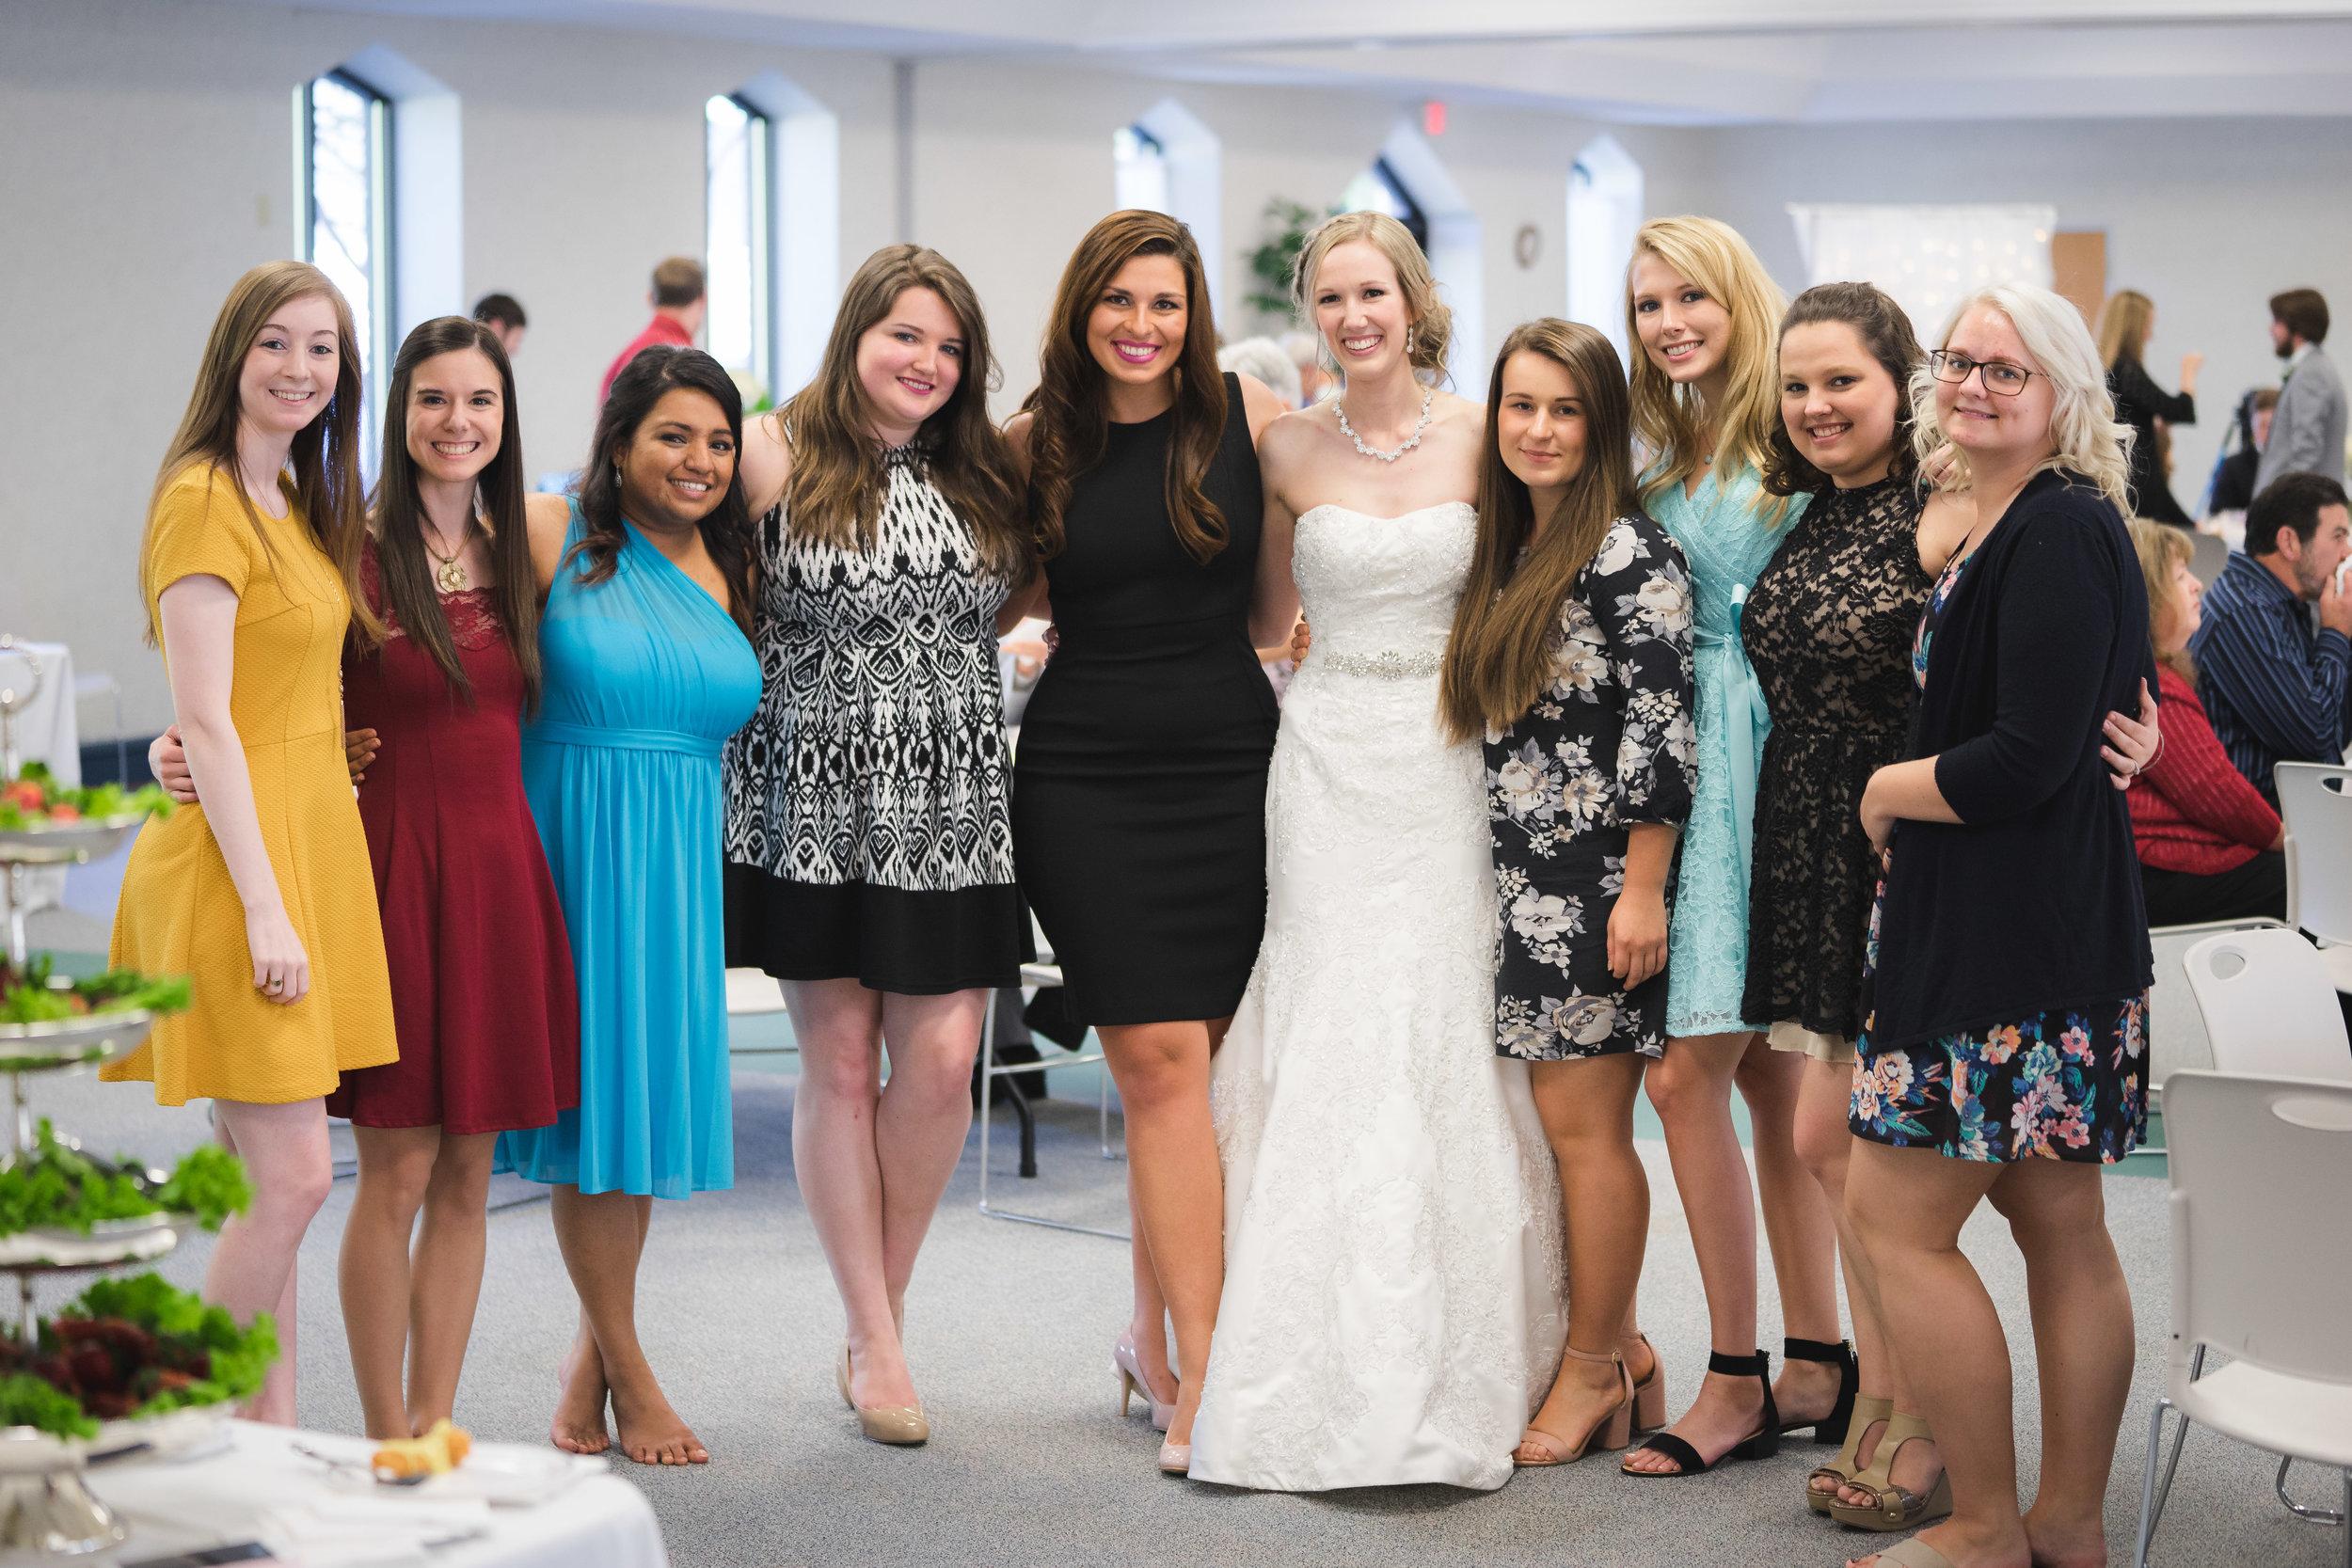 Greenville Wedding | Morningside Baptist Church Spartanburg SC Reception Guests